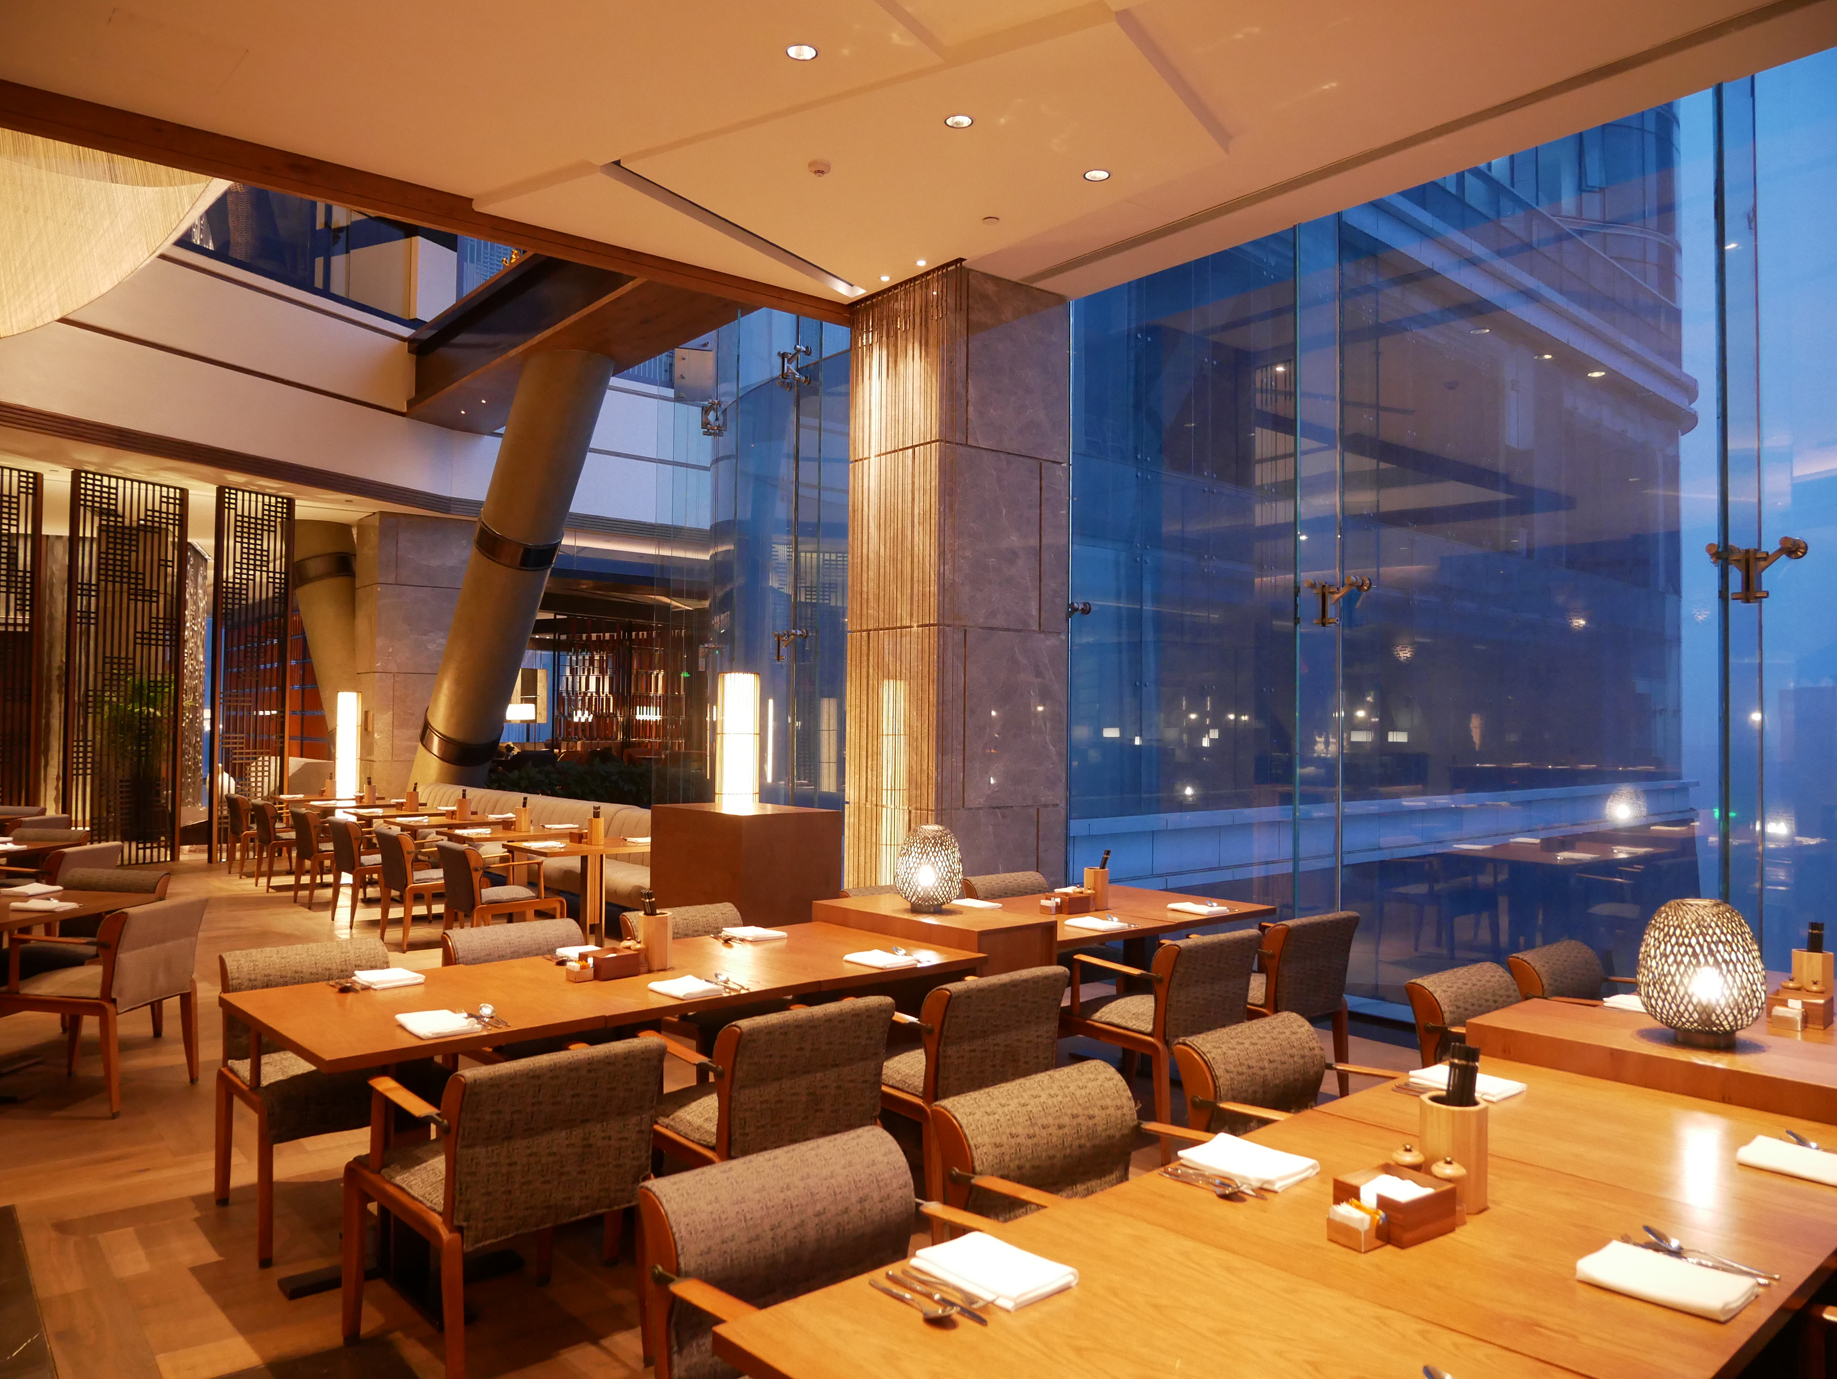 Xian Grand Hyatt breakfast room 2.jpg